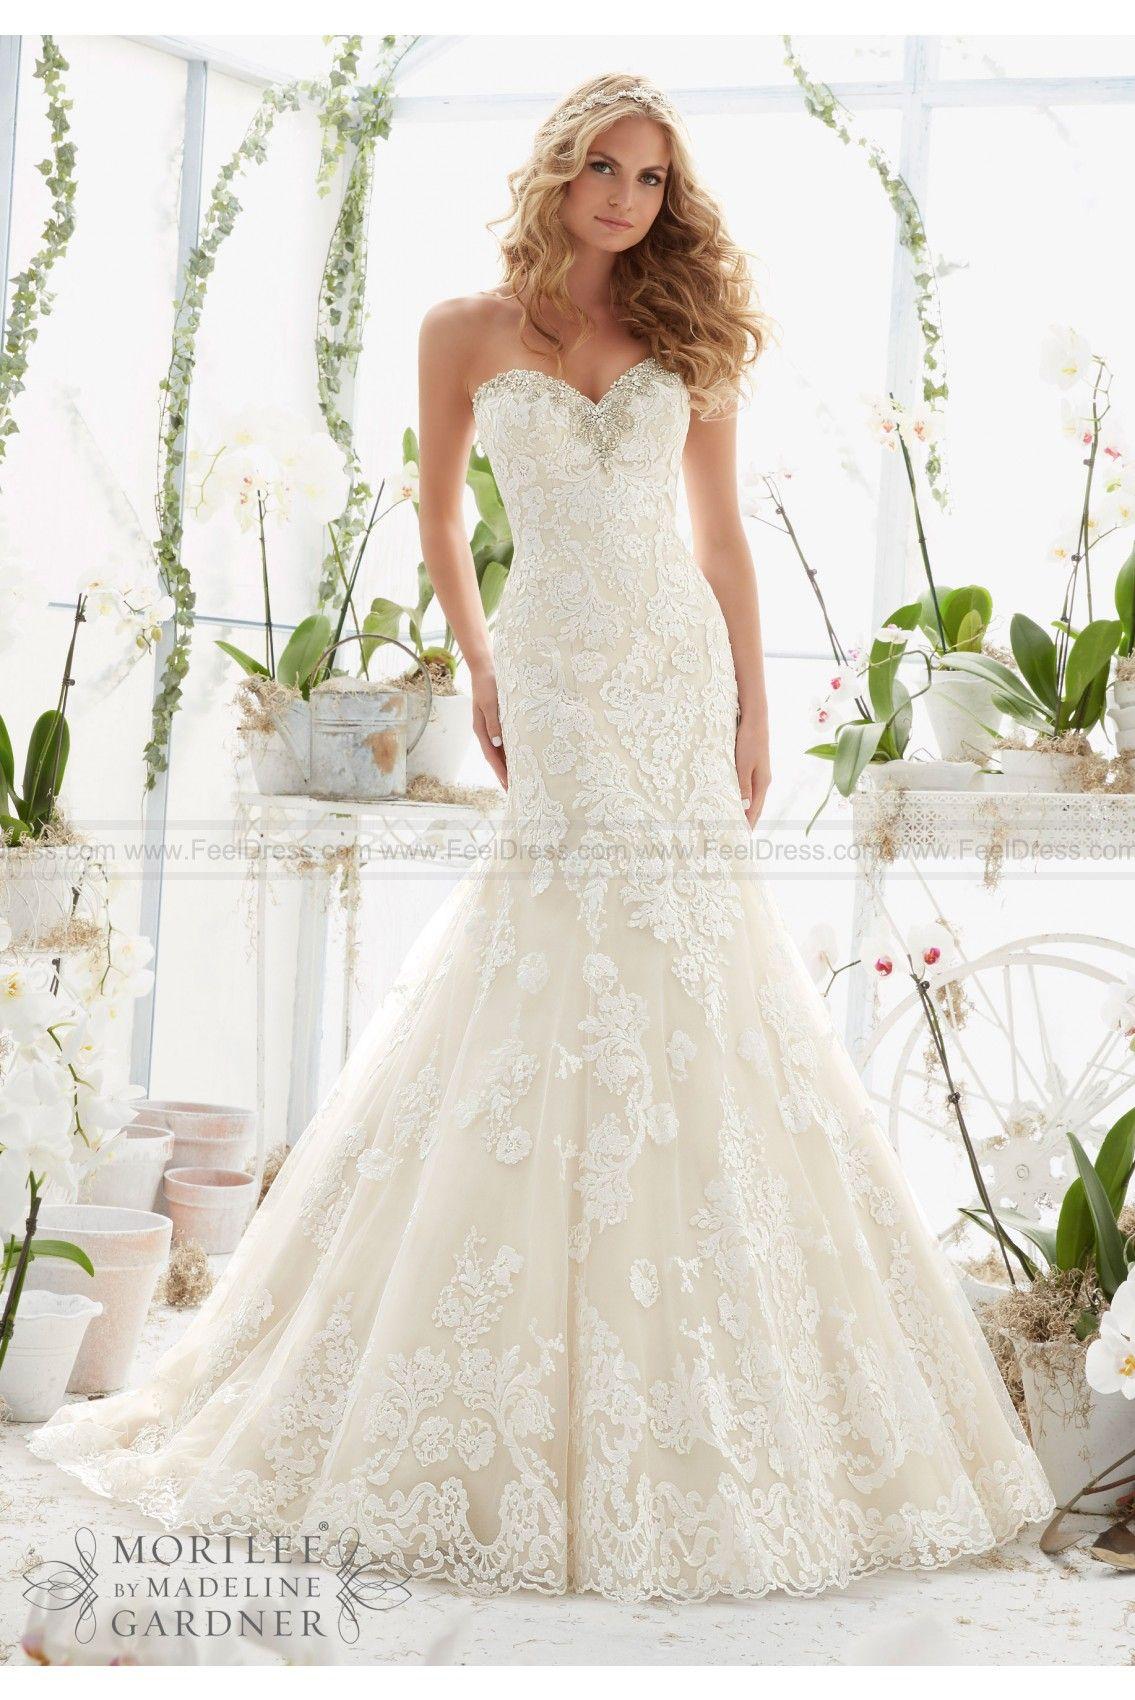 Wedding dresses styles  Mori Lee Wedding Dresses Style   weddingdress  Pinterest